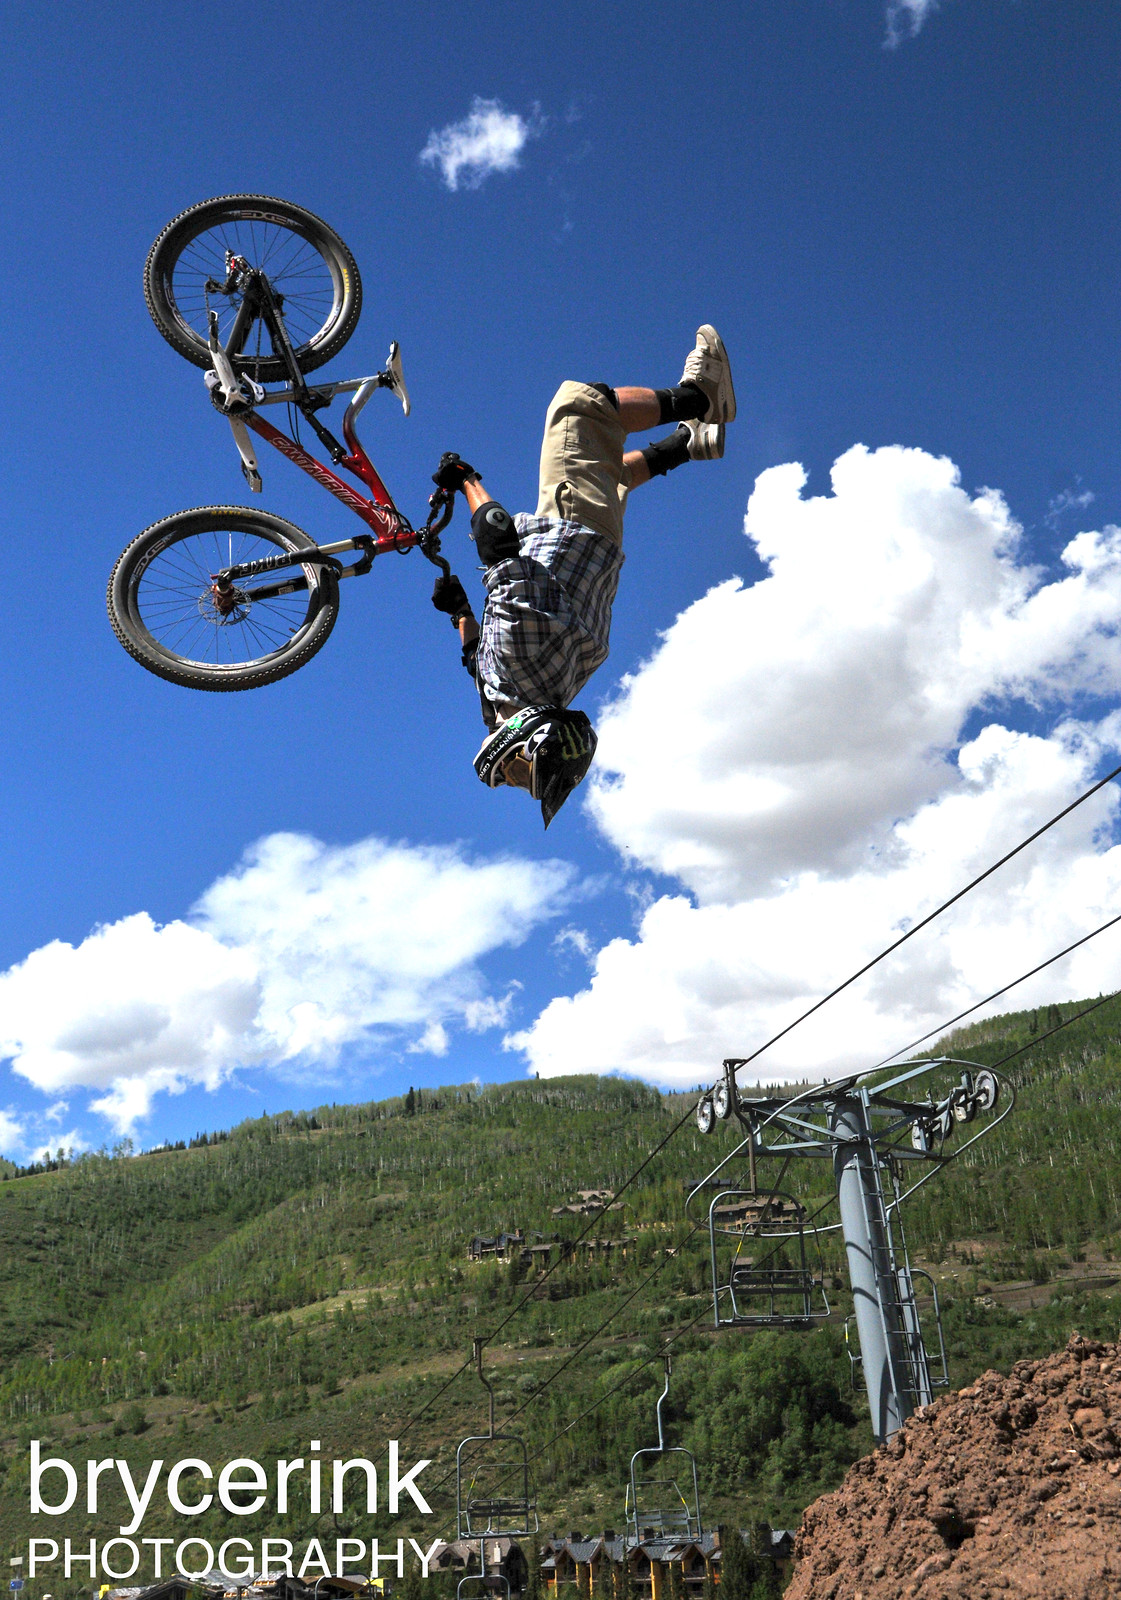 DSC_7382 - Brycerink - Mountain Biking Pictures - Vital MTB